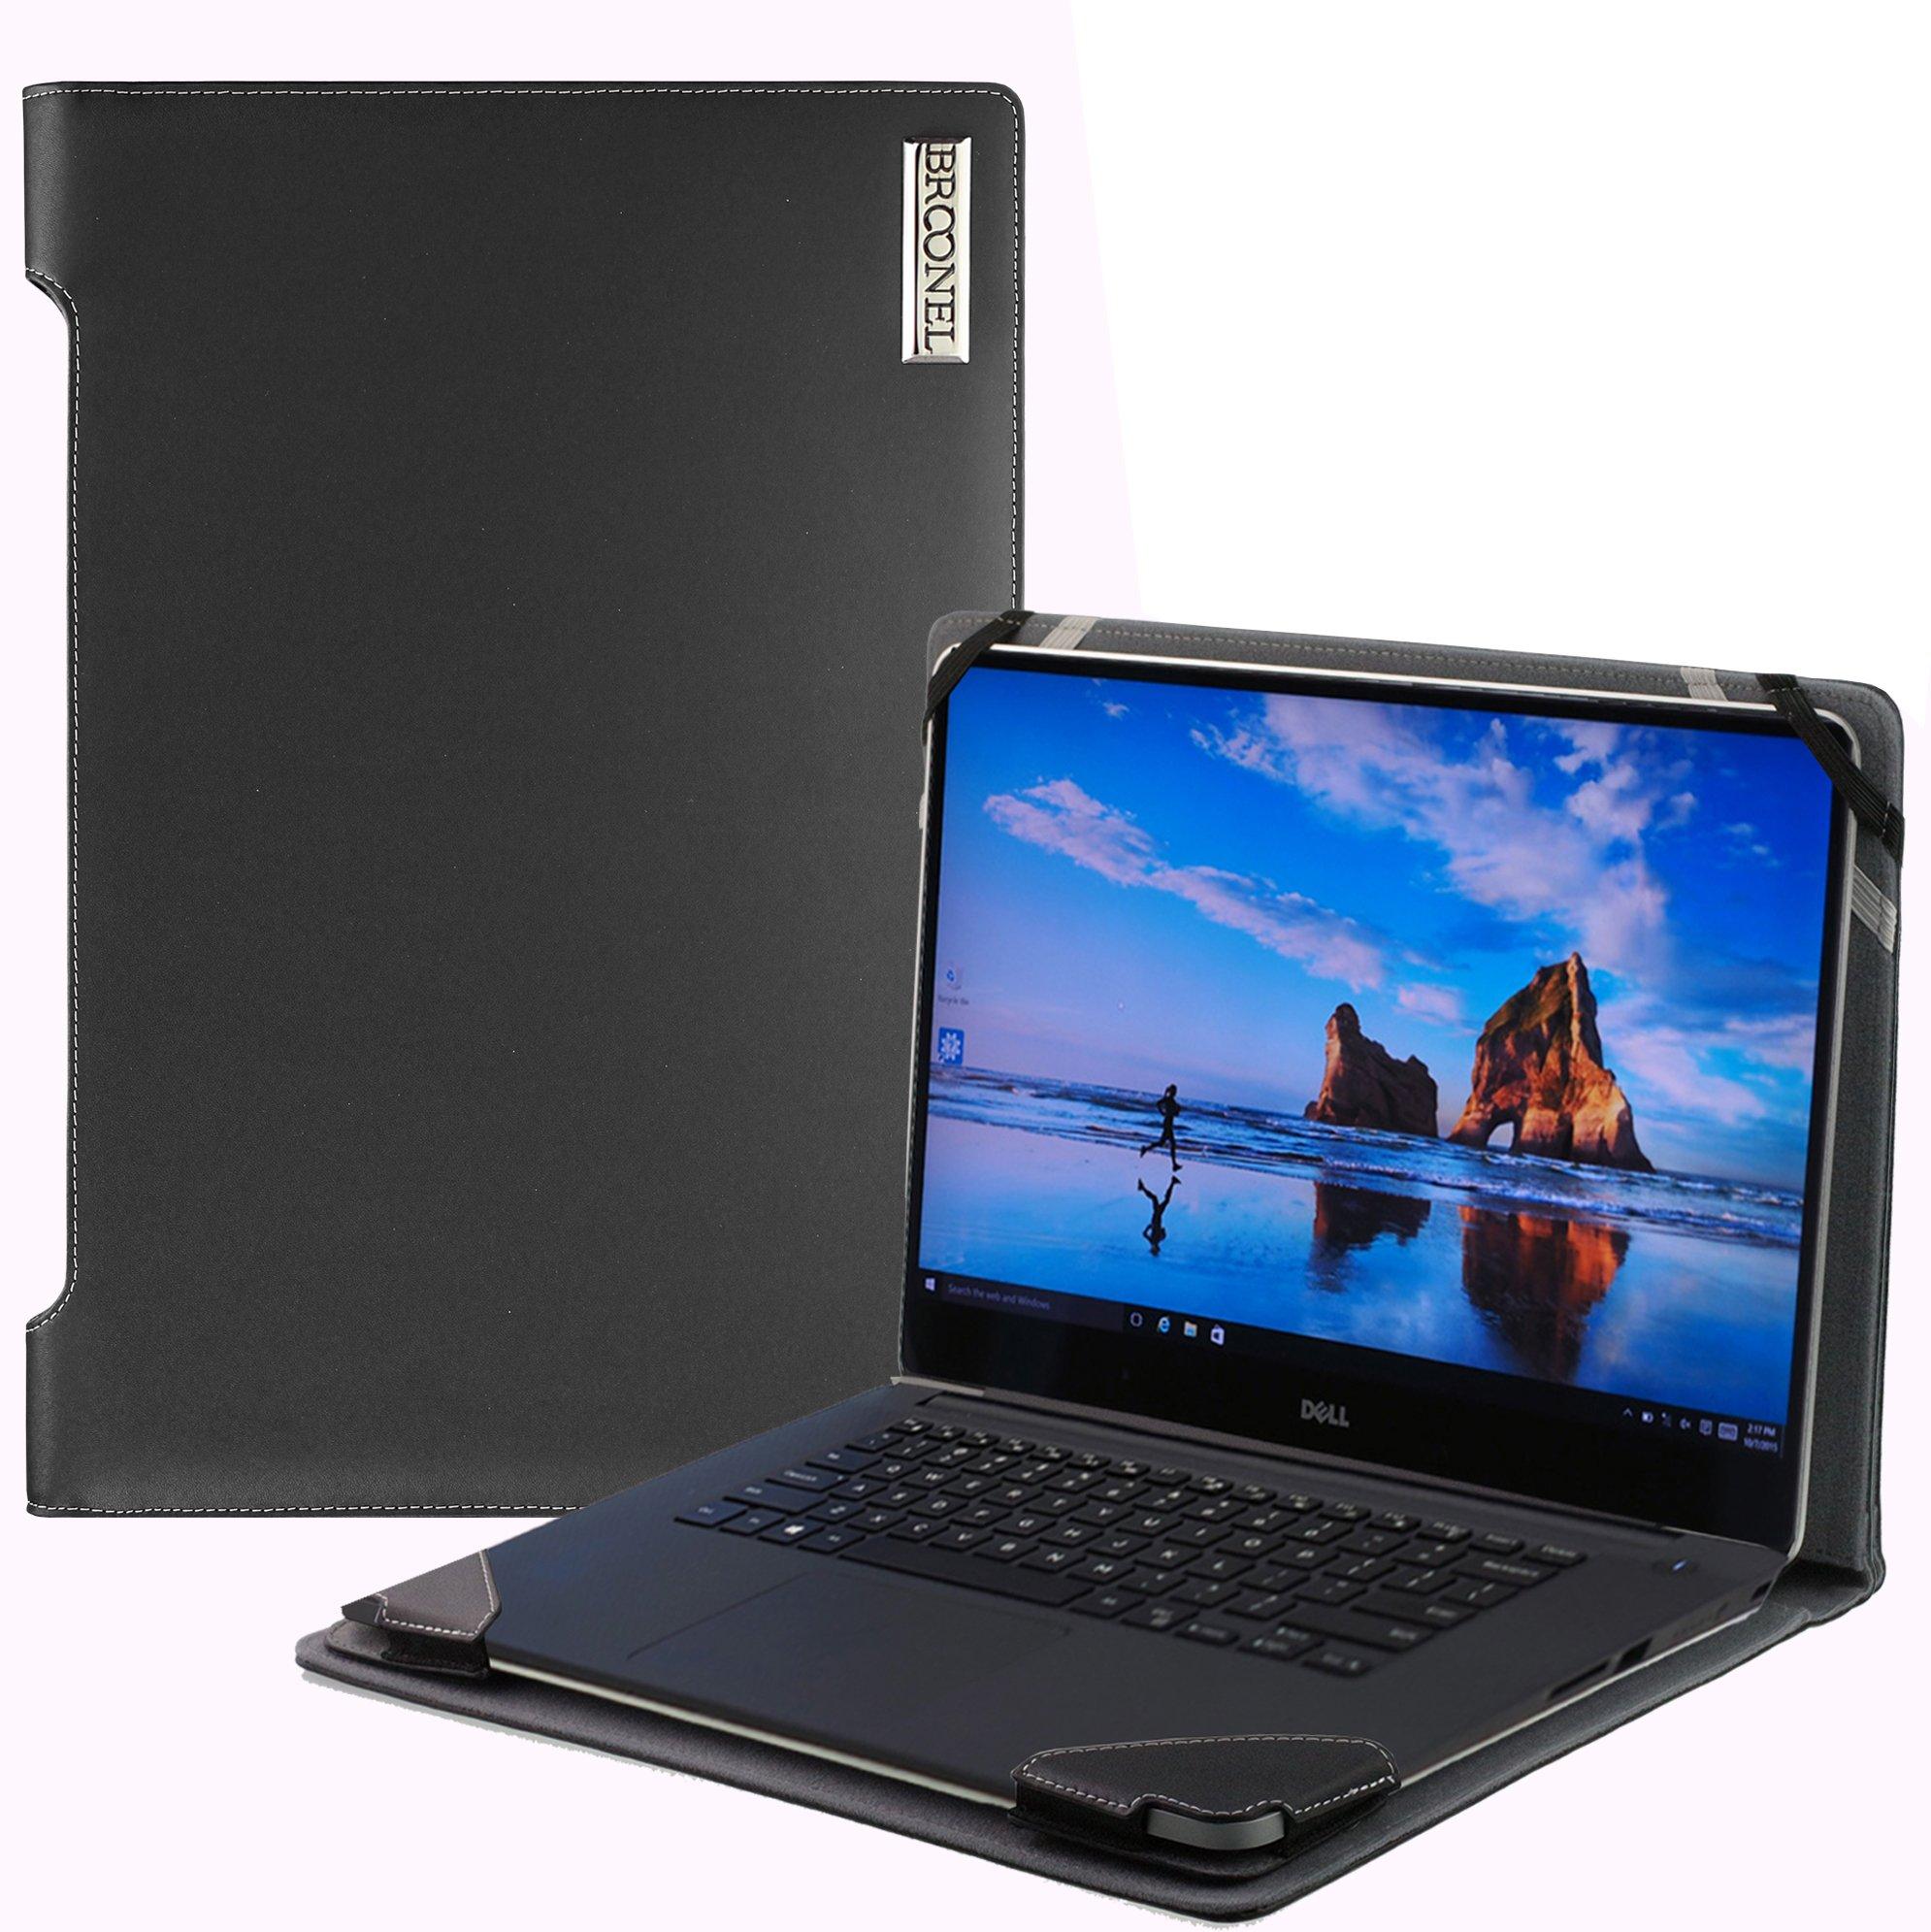 Broonel London - Profile Series - Black Vegan Leather Laptop Case Cover Sleeve For The DELLInspiron 15 5000 15.6'' Laptop - Black